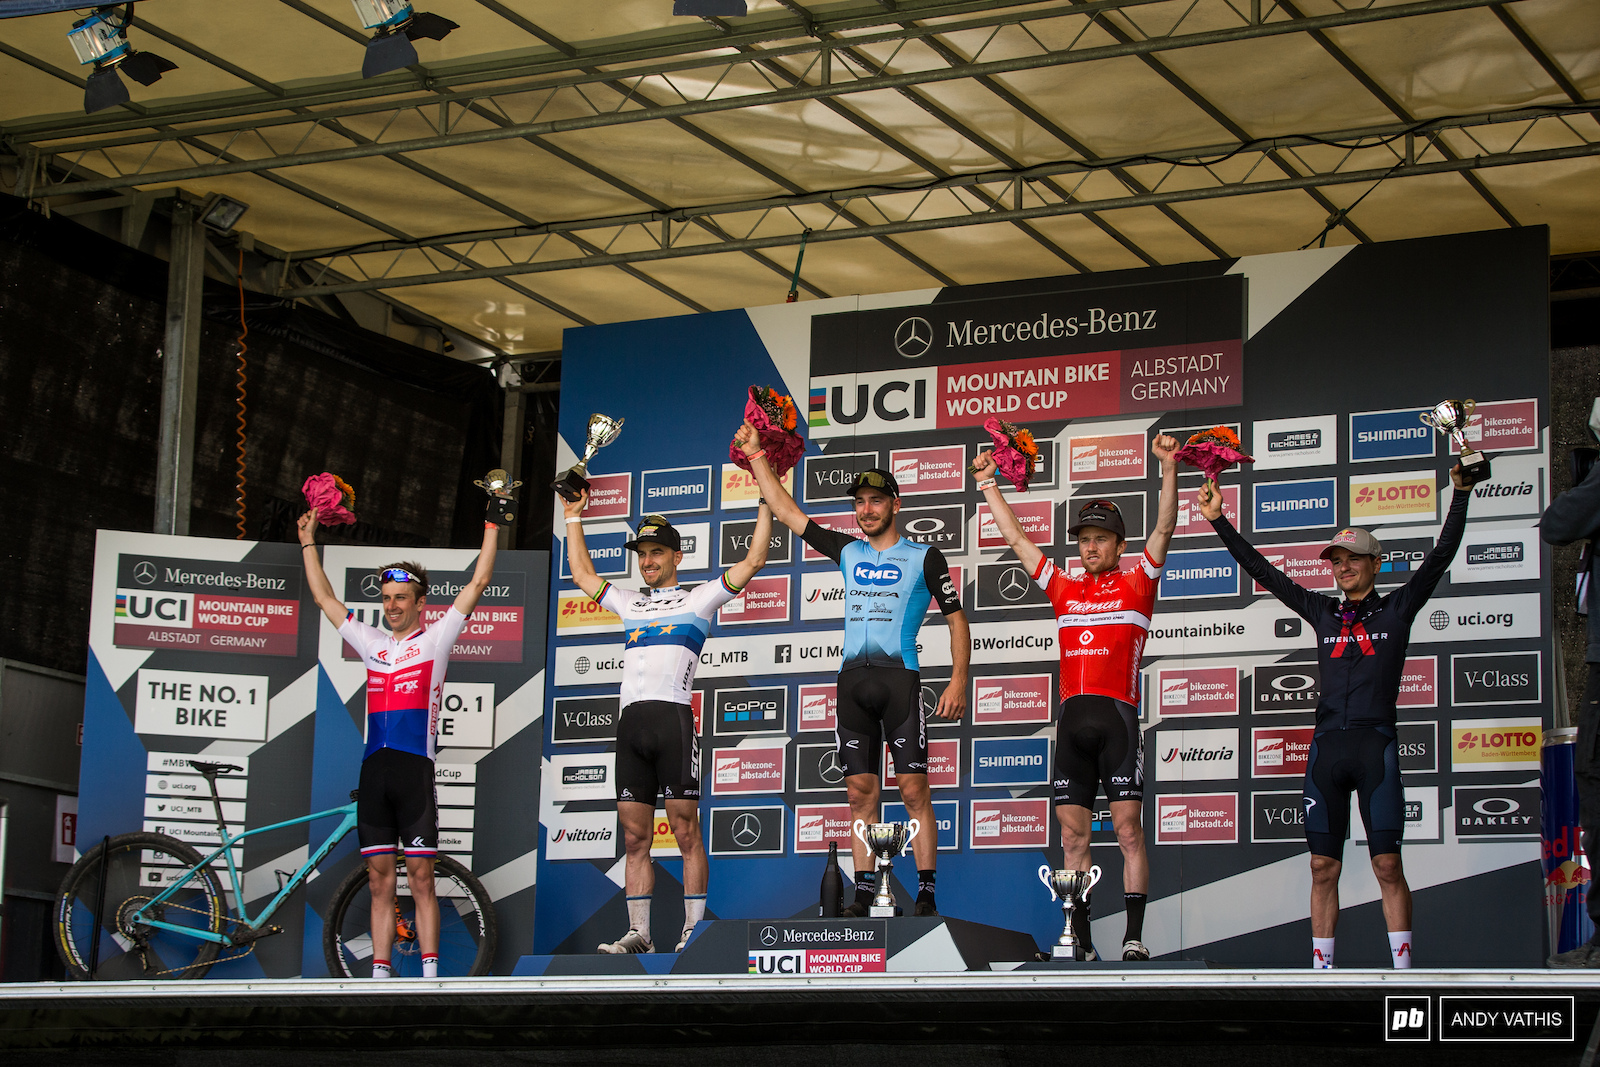 Your top 5 men 1st Victor Koretzky 2nd Nino Schurter 3rd Mathias Flueckiger 4th Ondrej Cink 5th Thomas Pidcock